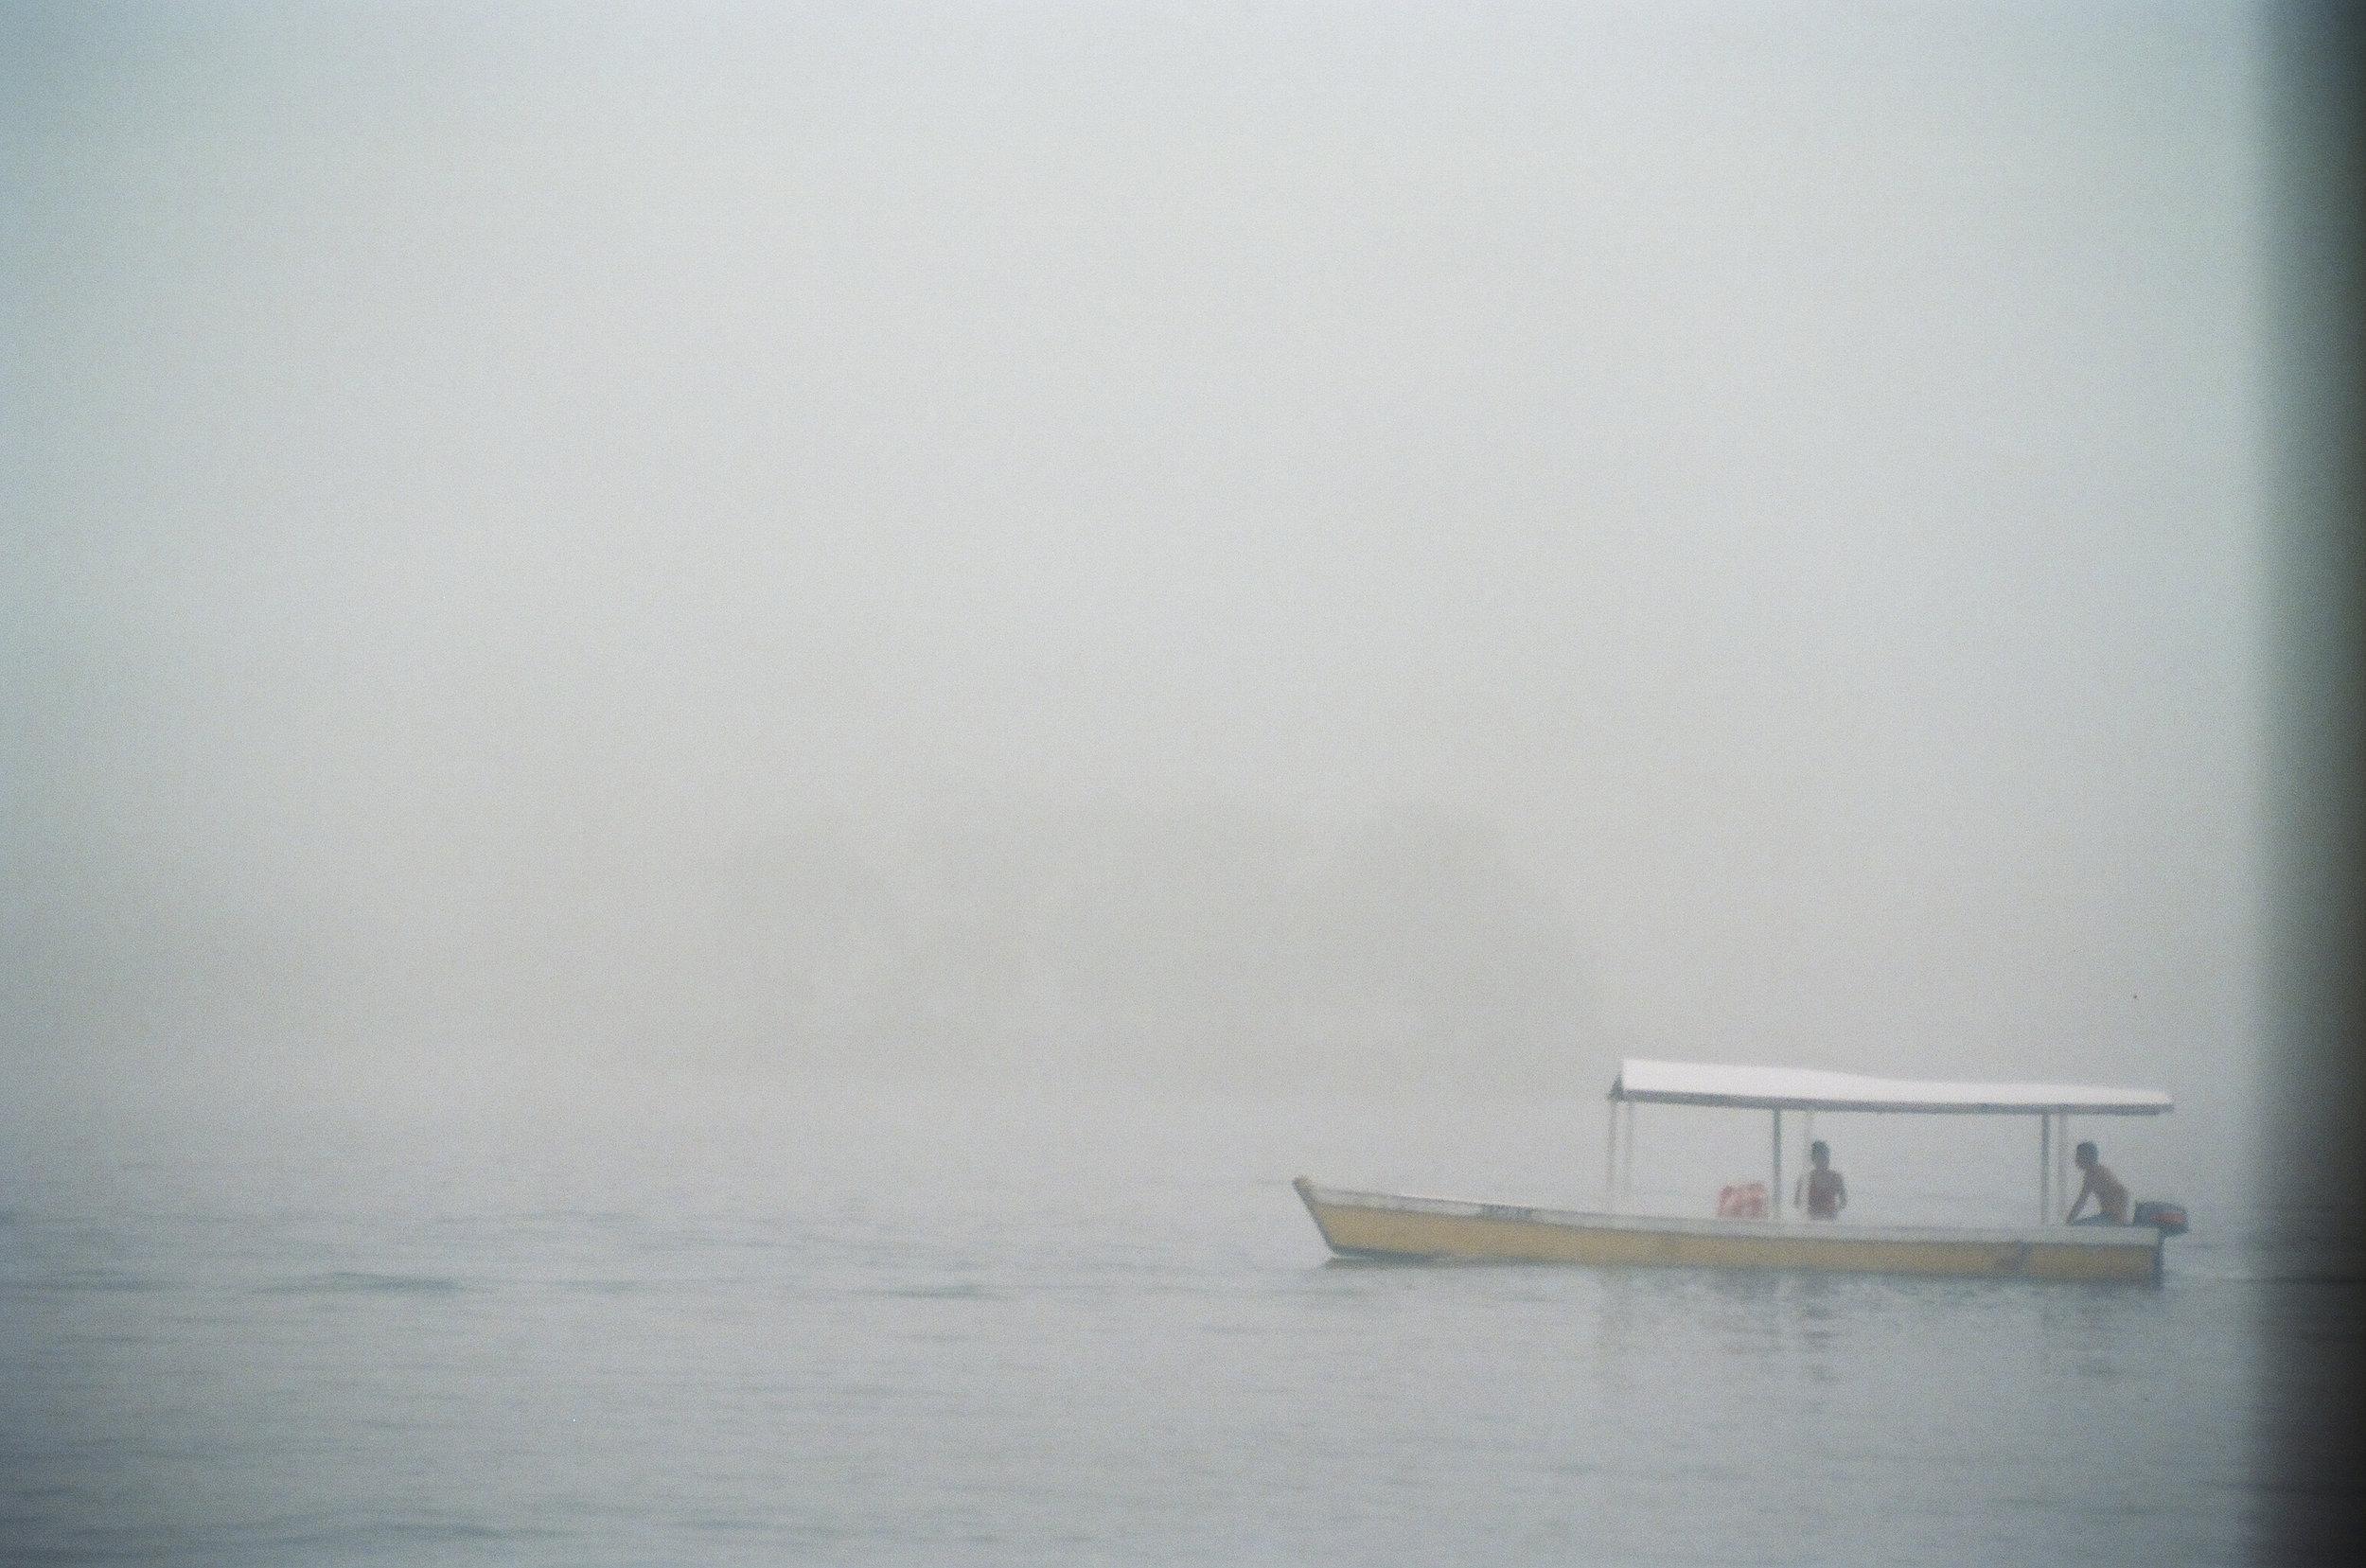 Guatemala_1_40.jpg